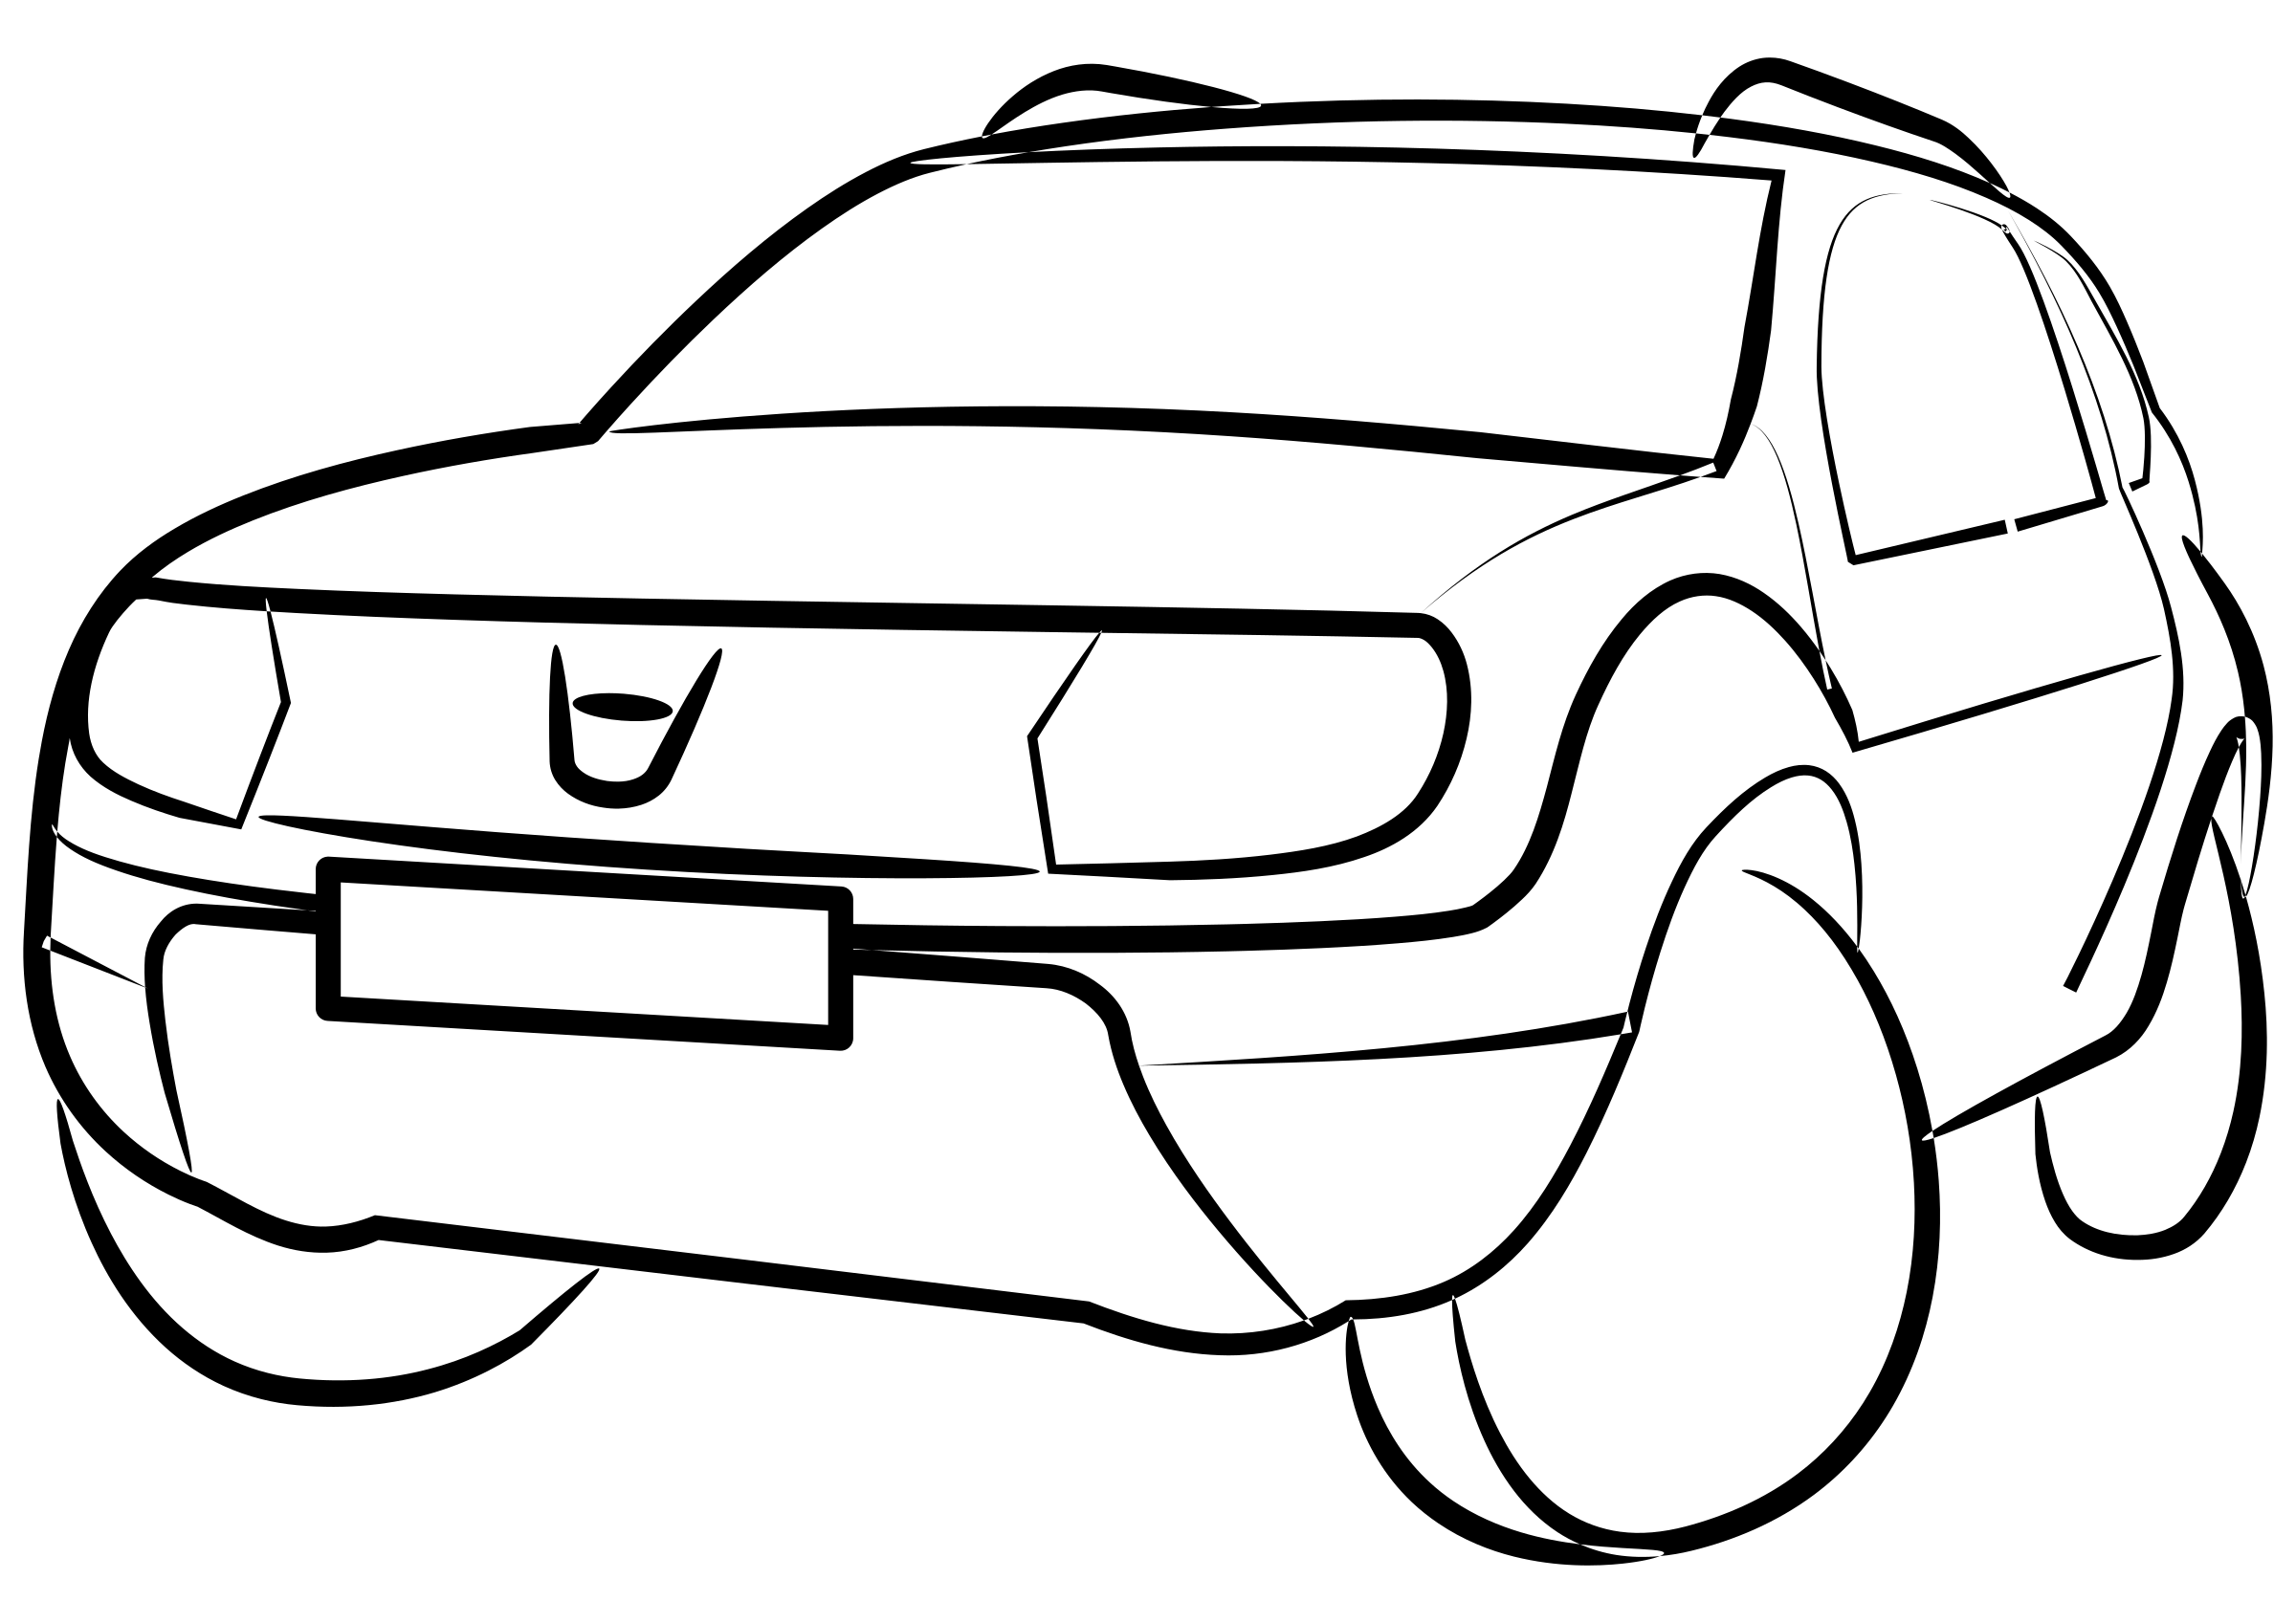 2400x1697 Daciadustershiluette Icons Png